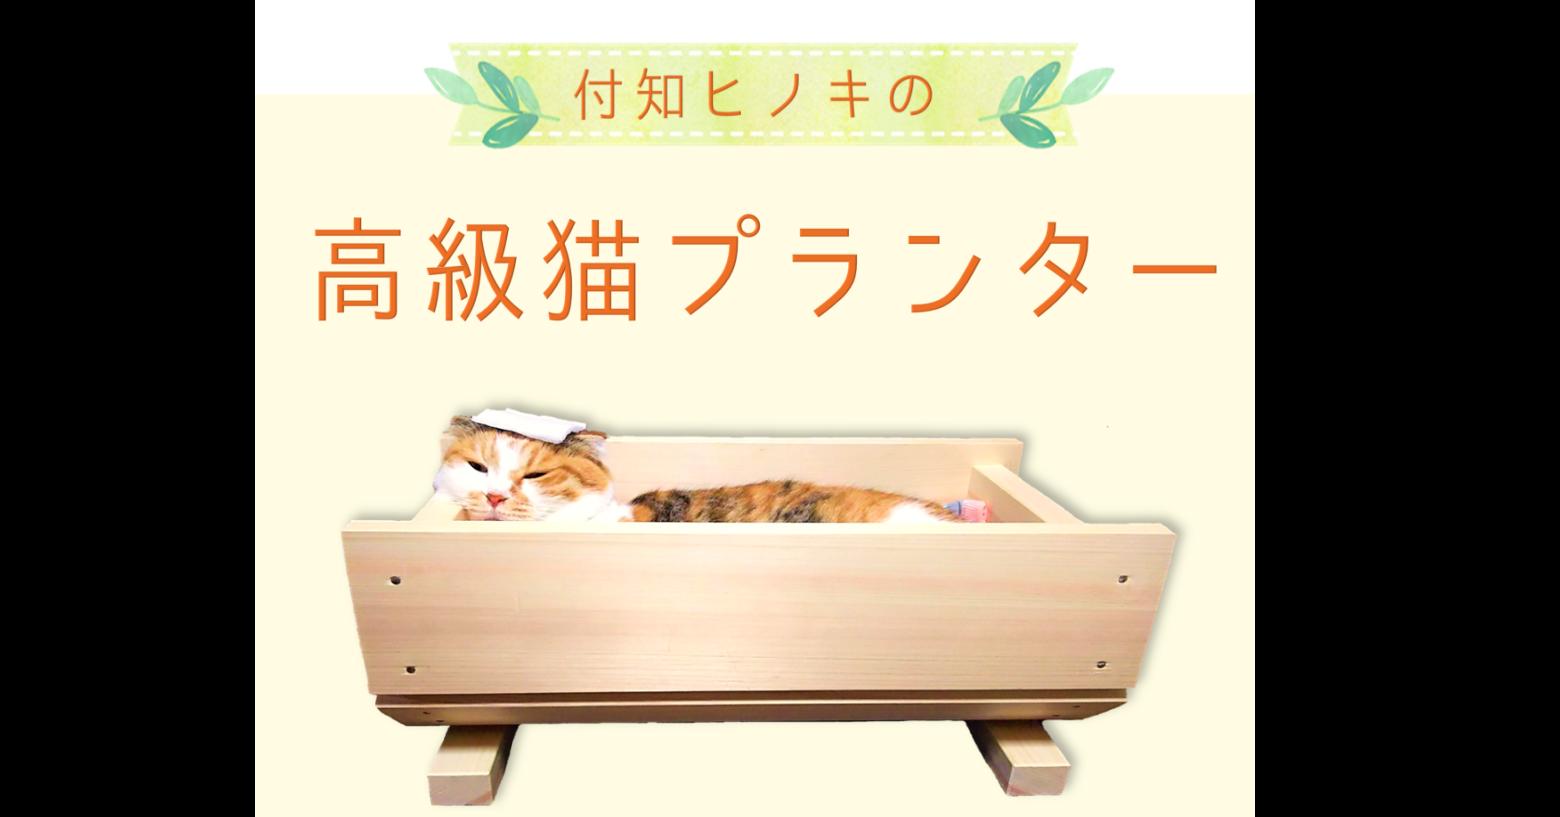 照片中提到了付知ヒノキの、高級猫プランター,包含了表、築地町、貓、扁柏、岐阜県中津川市